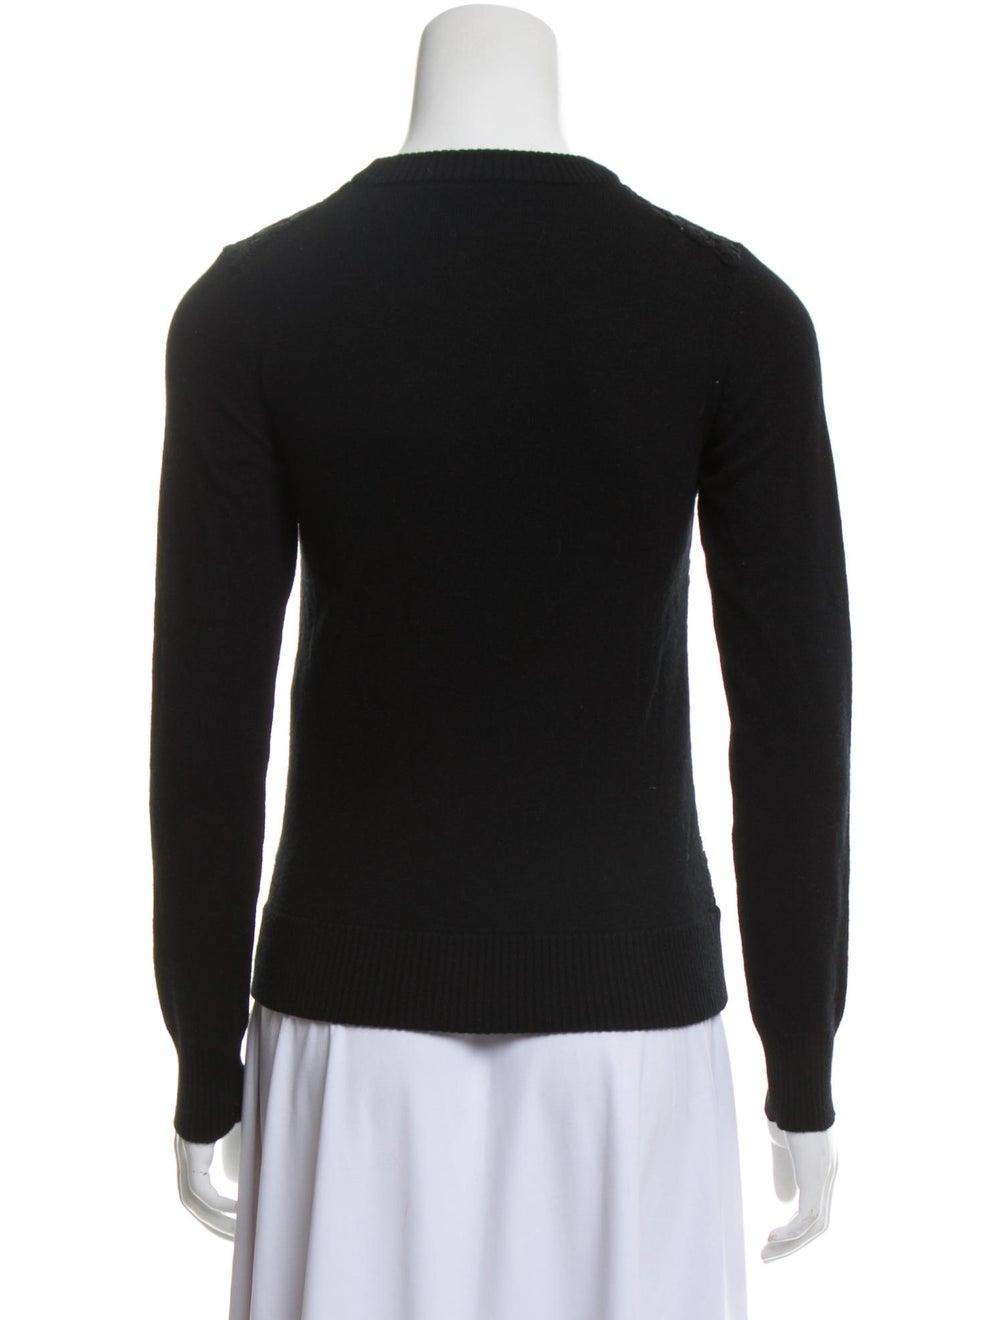 Chloé Virgin Wool Lace Sweater Black - image 3